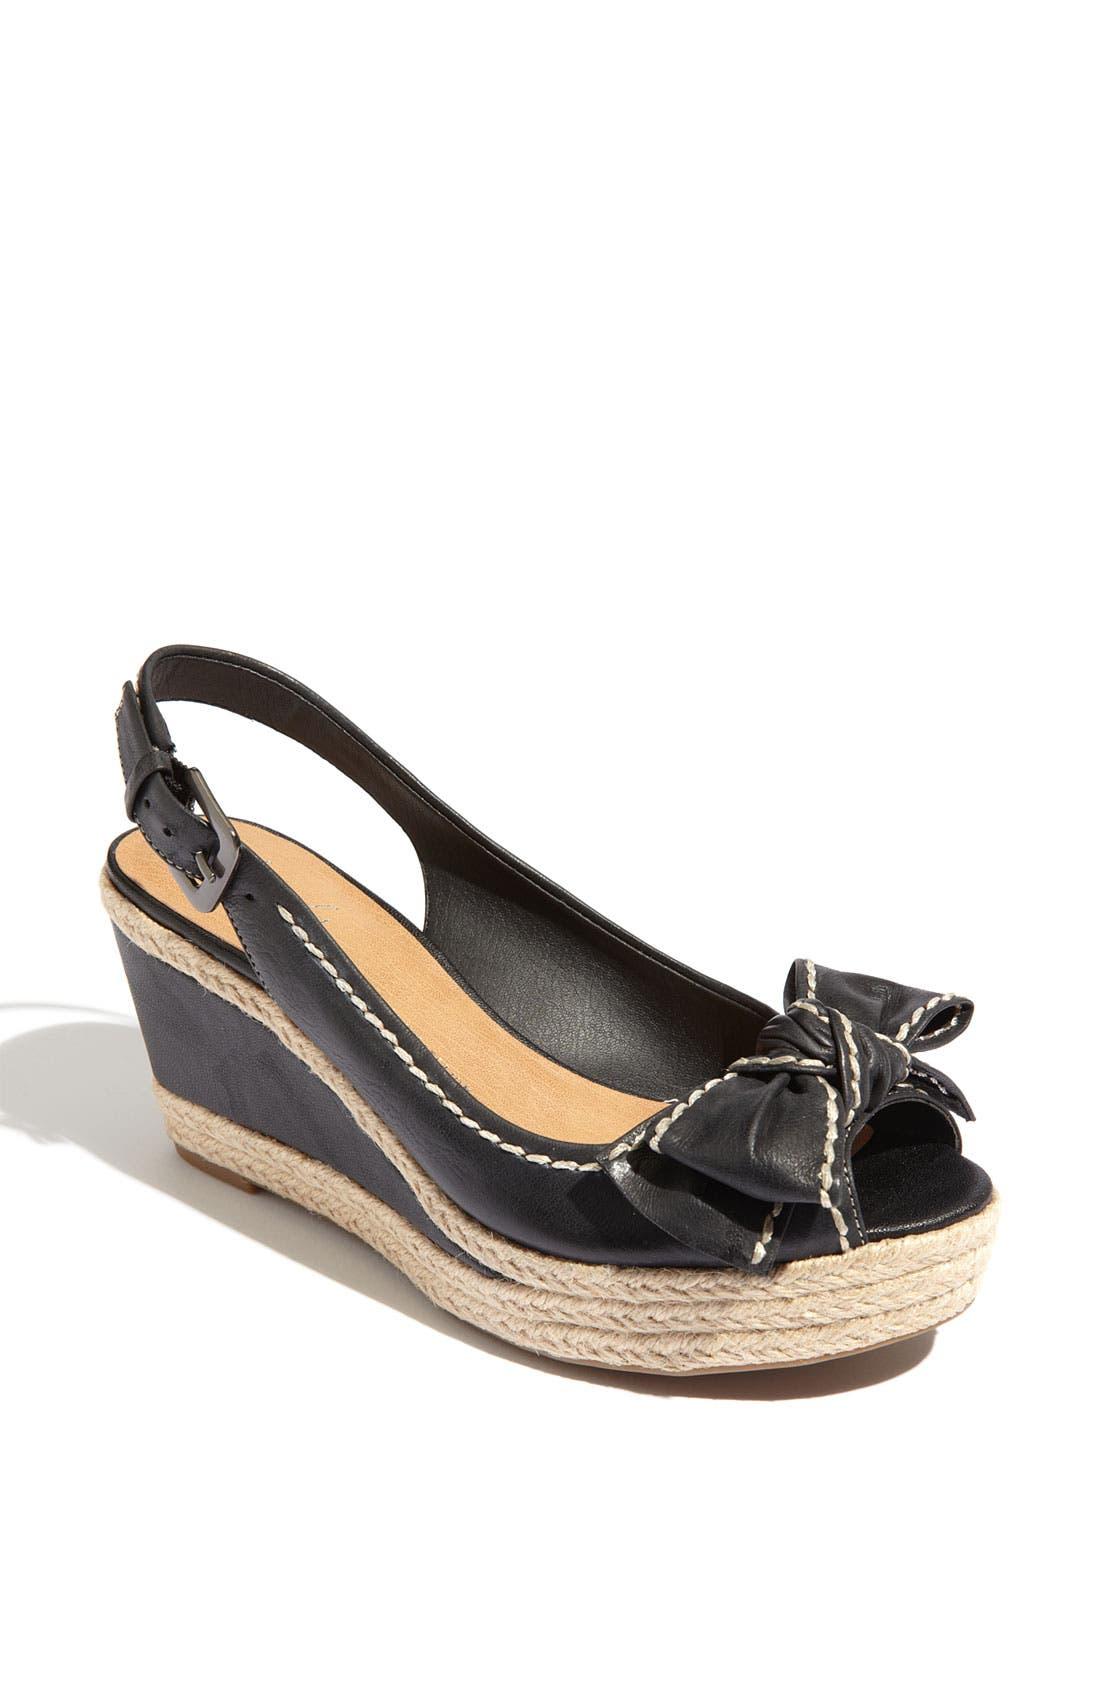 Main Image - Franco Sarto 'Olympia' Espadrille Sandal